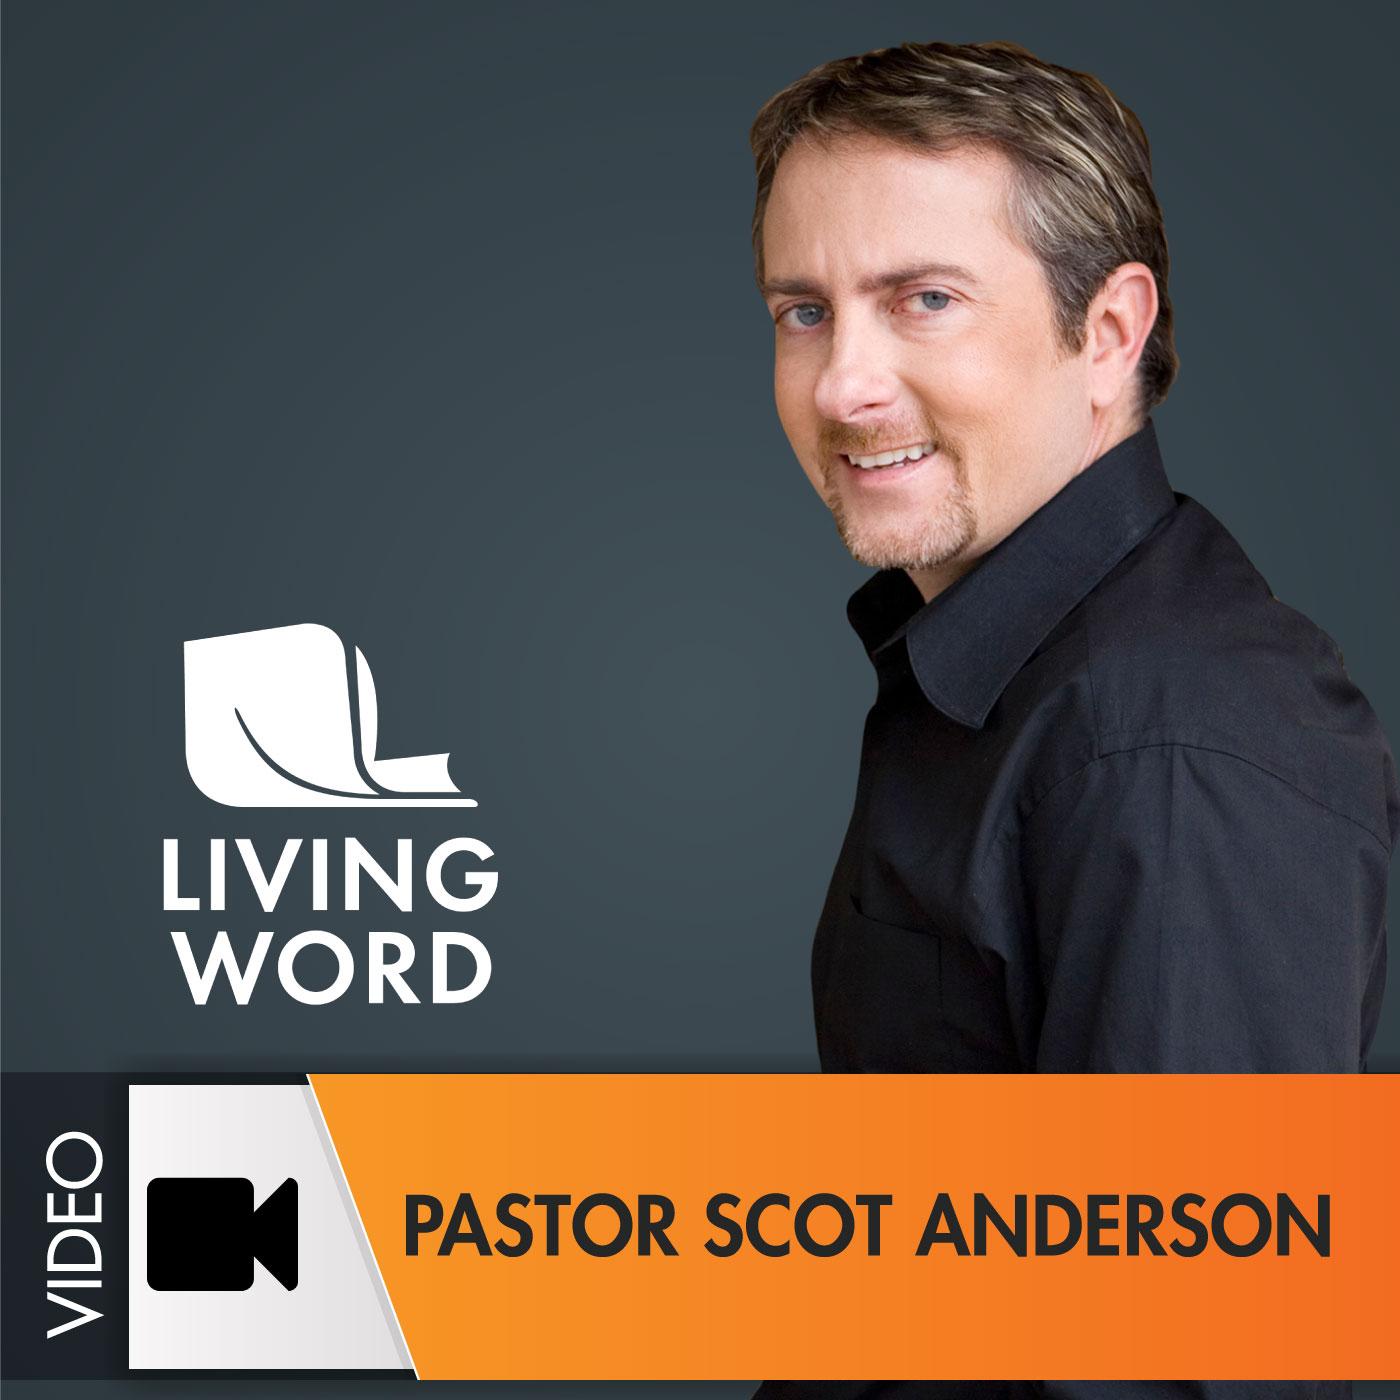 Pastor Scot Anderson - Video